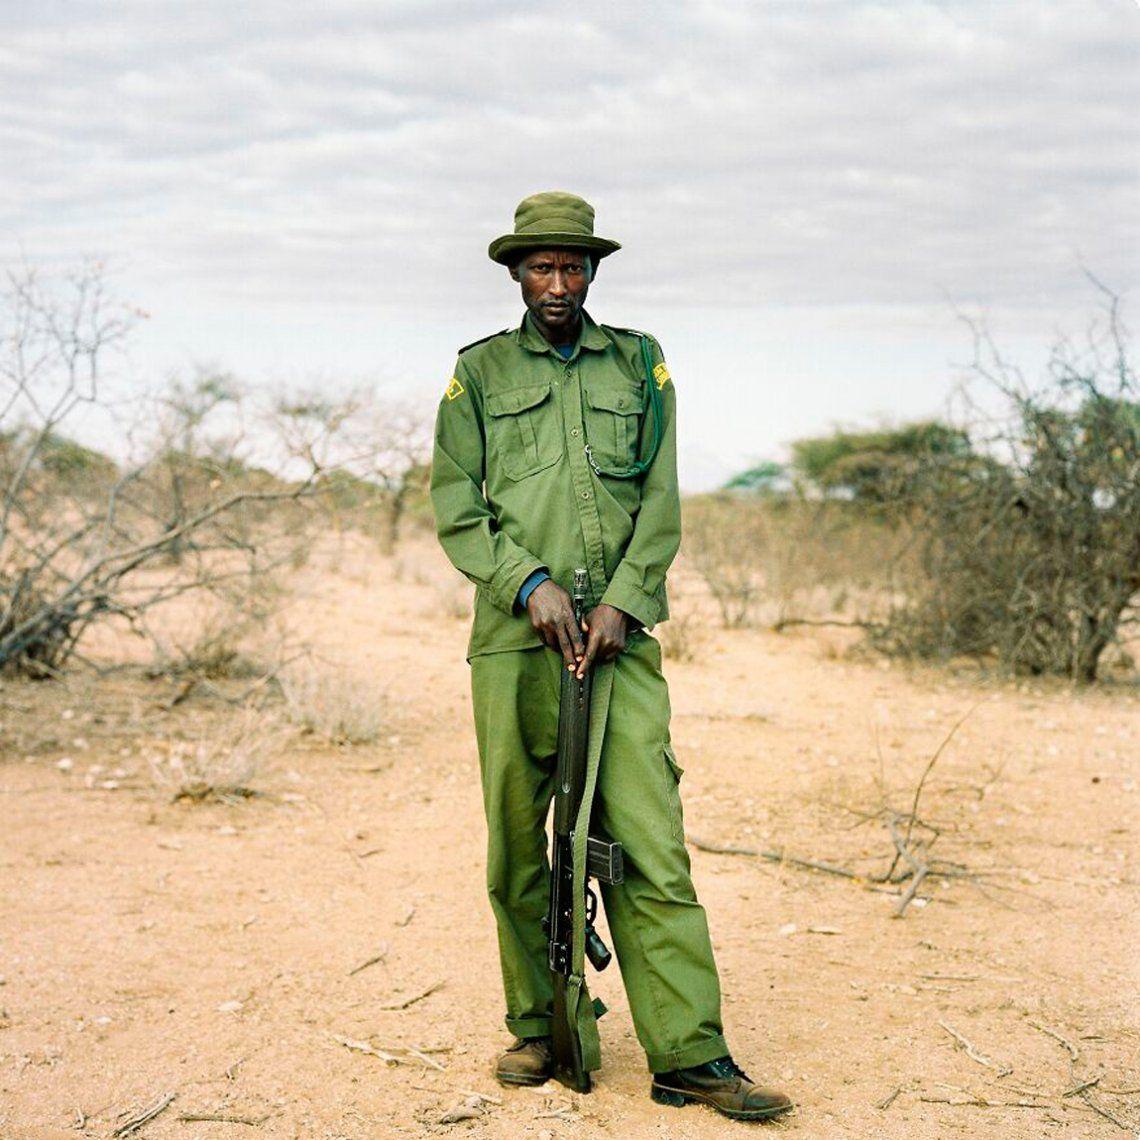 Ranger Adamson (3er lugar / Analógico / Cine / Retrato)